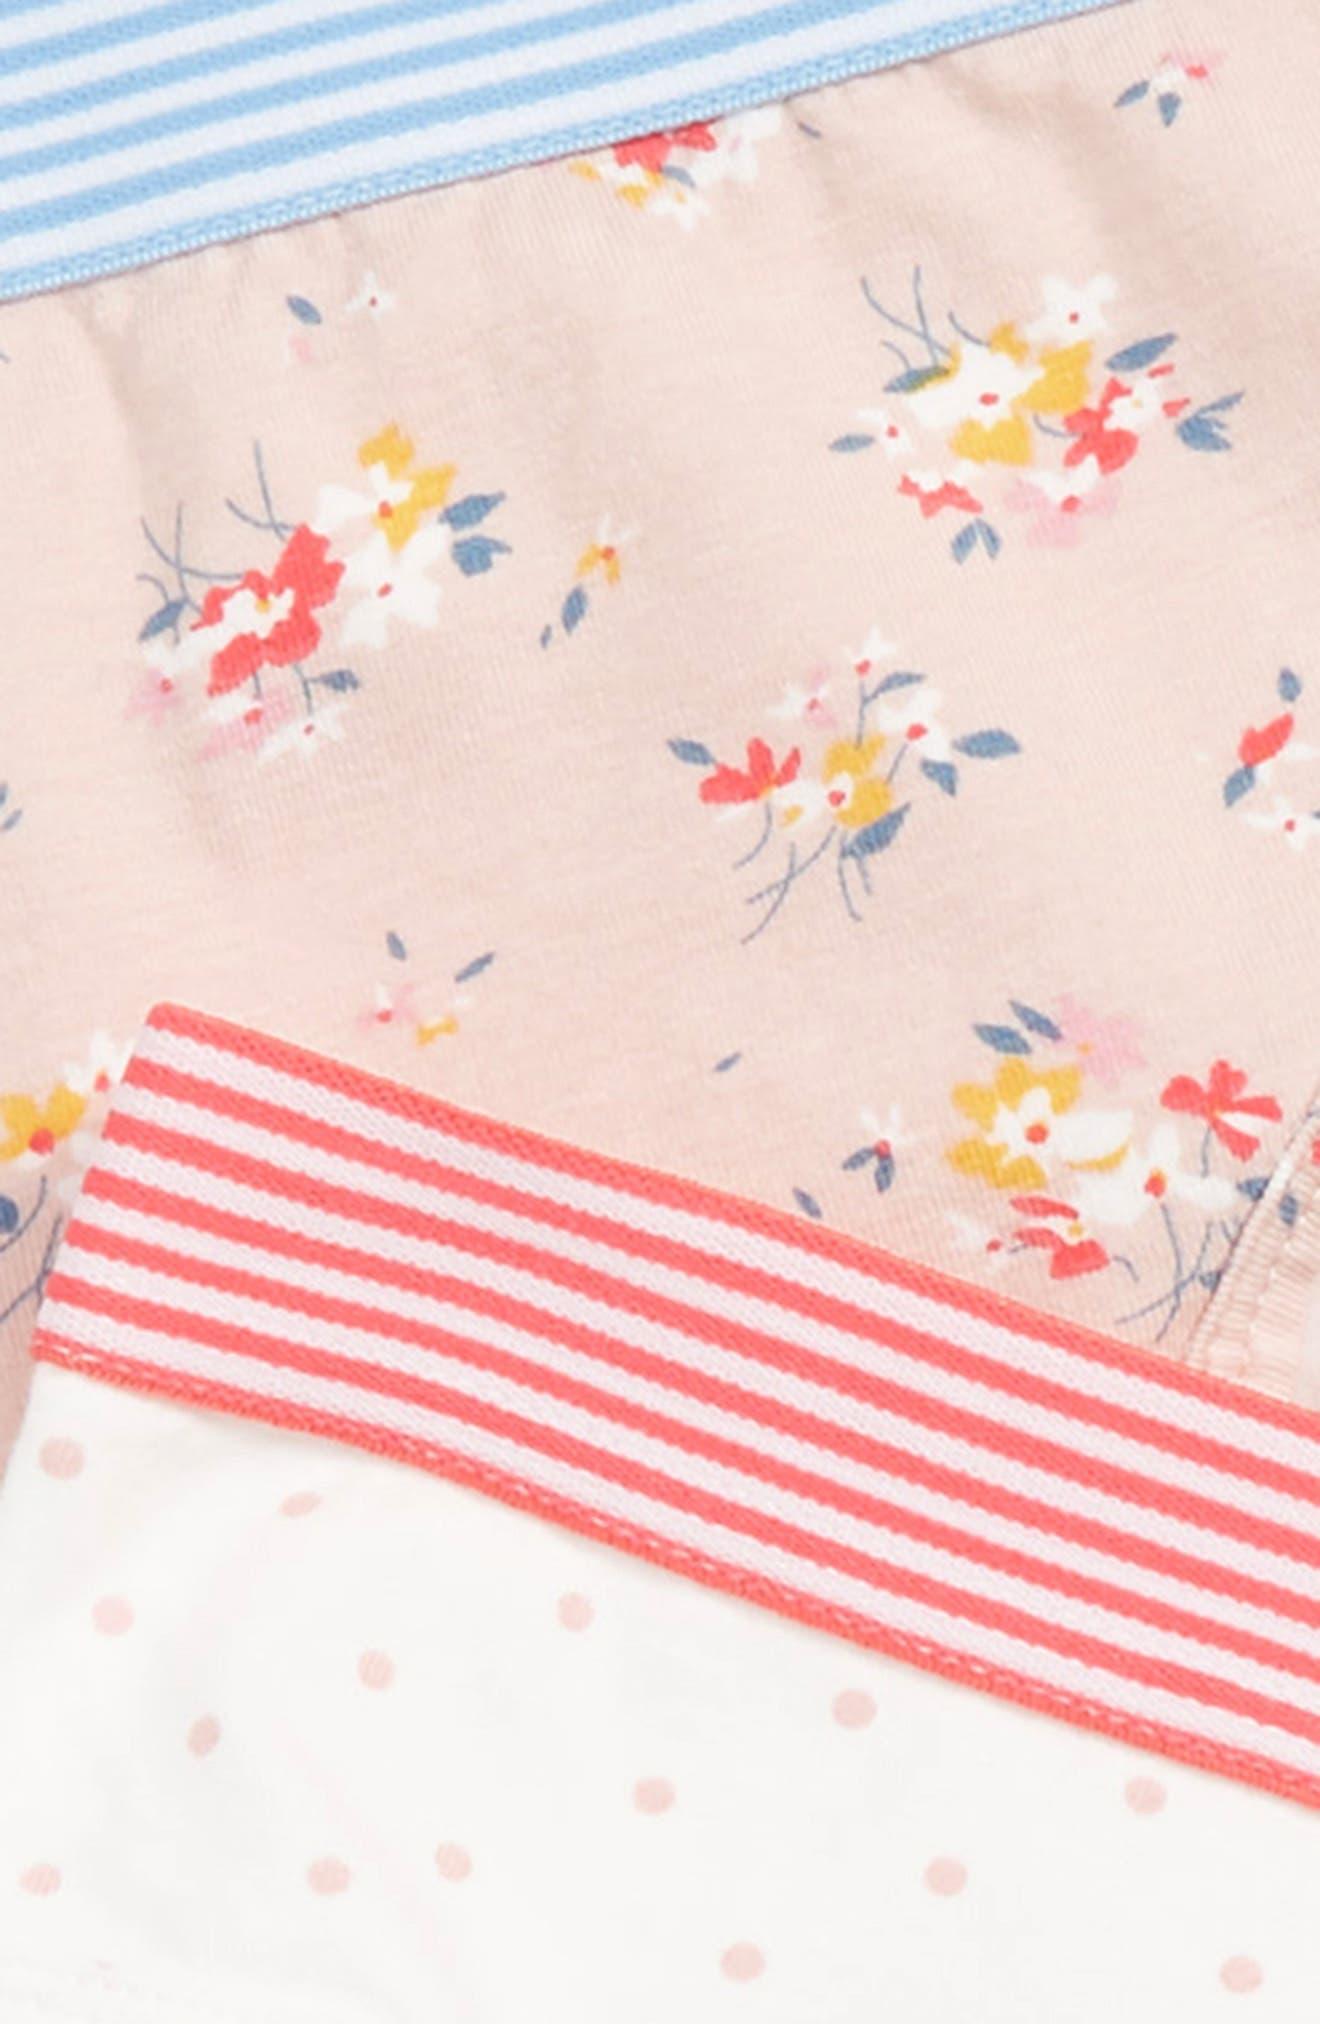 3-Pack Underwear,                             Alternate thumbnail 2, color,                             960